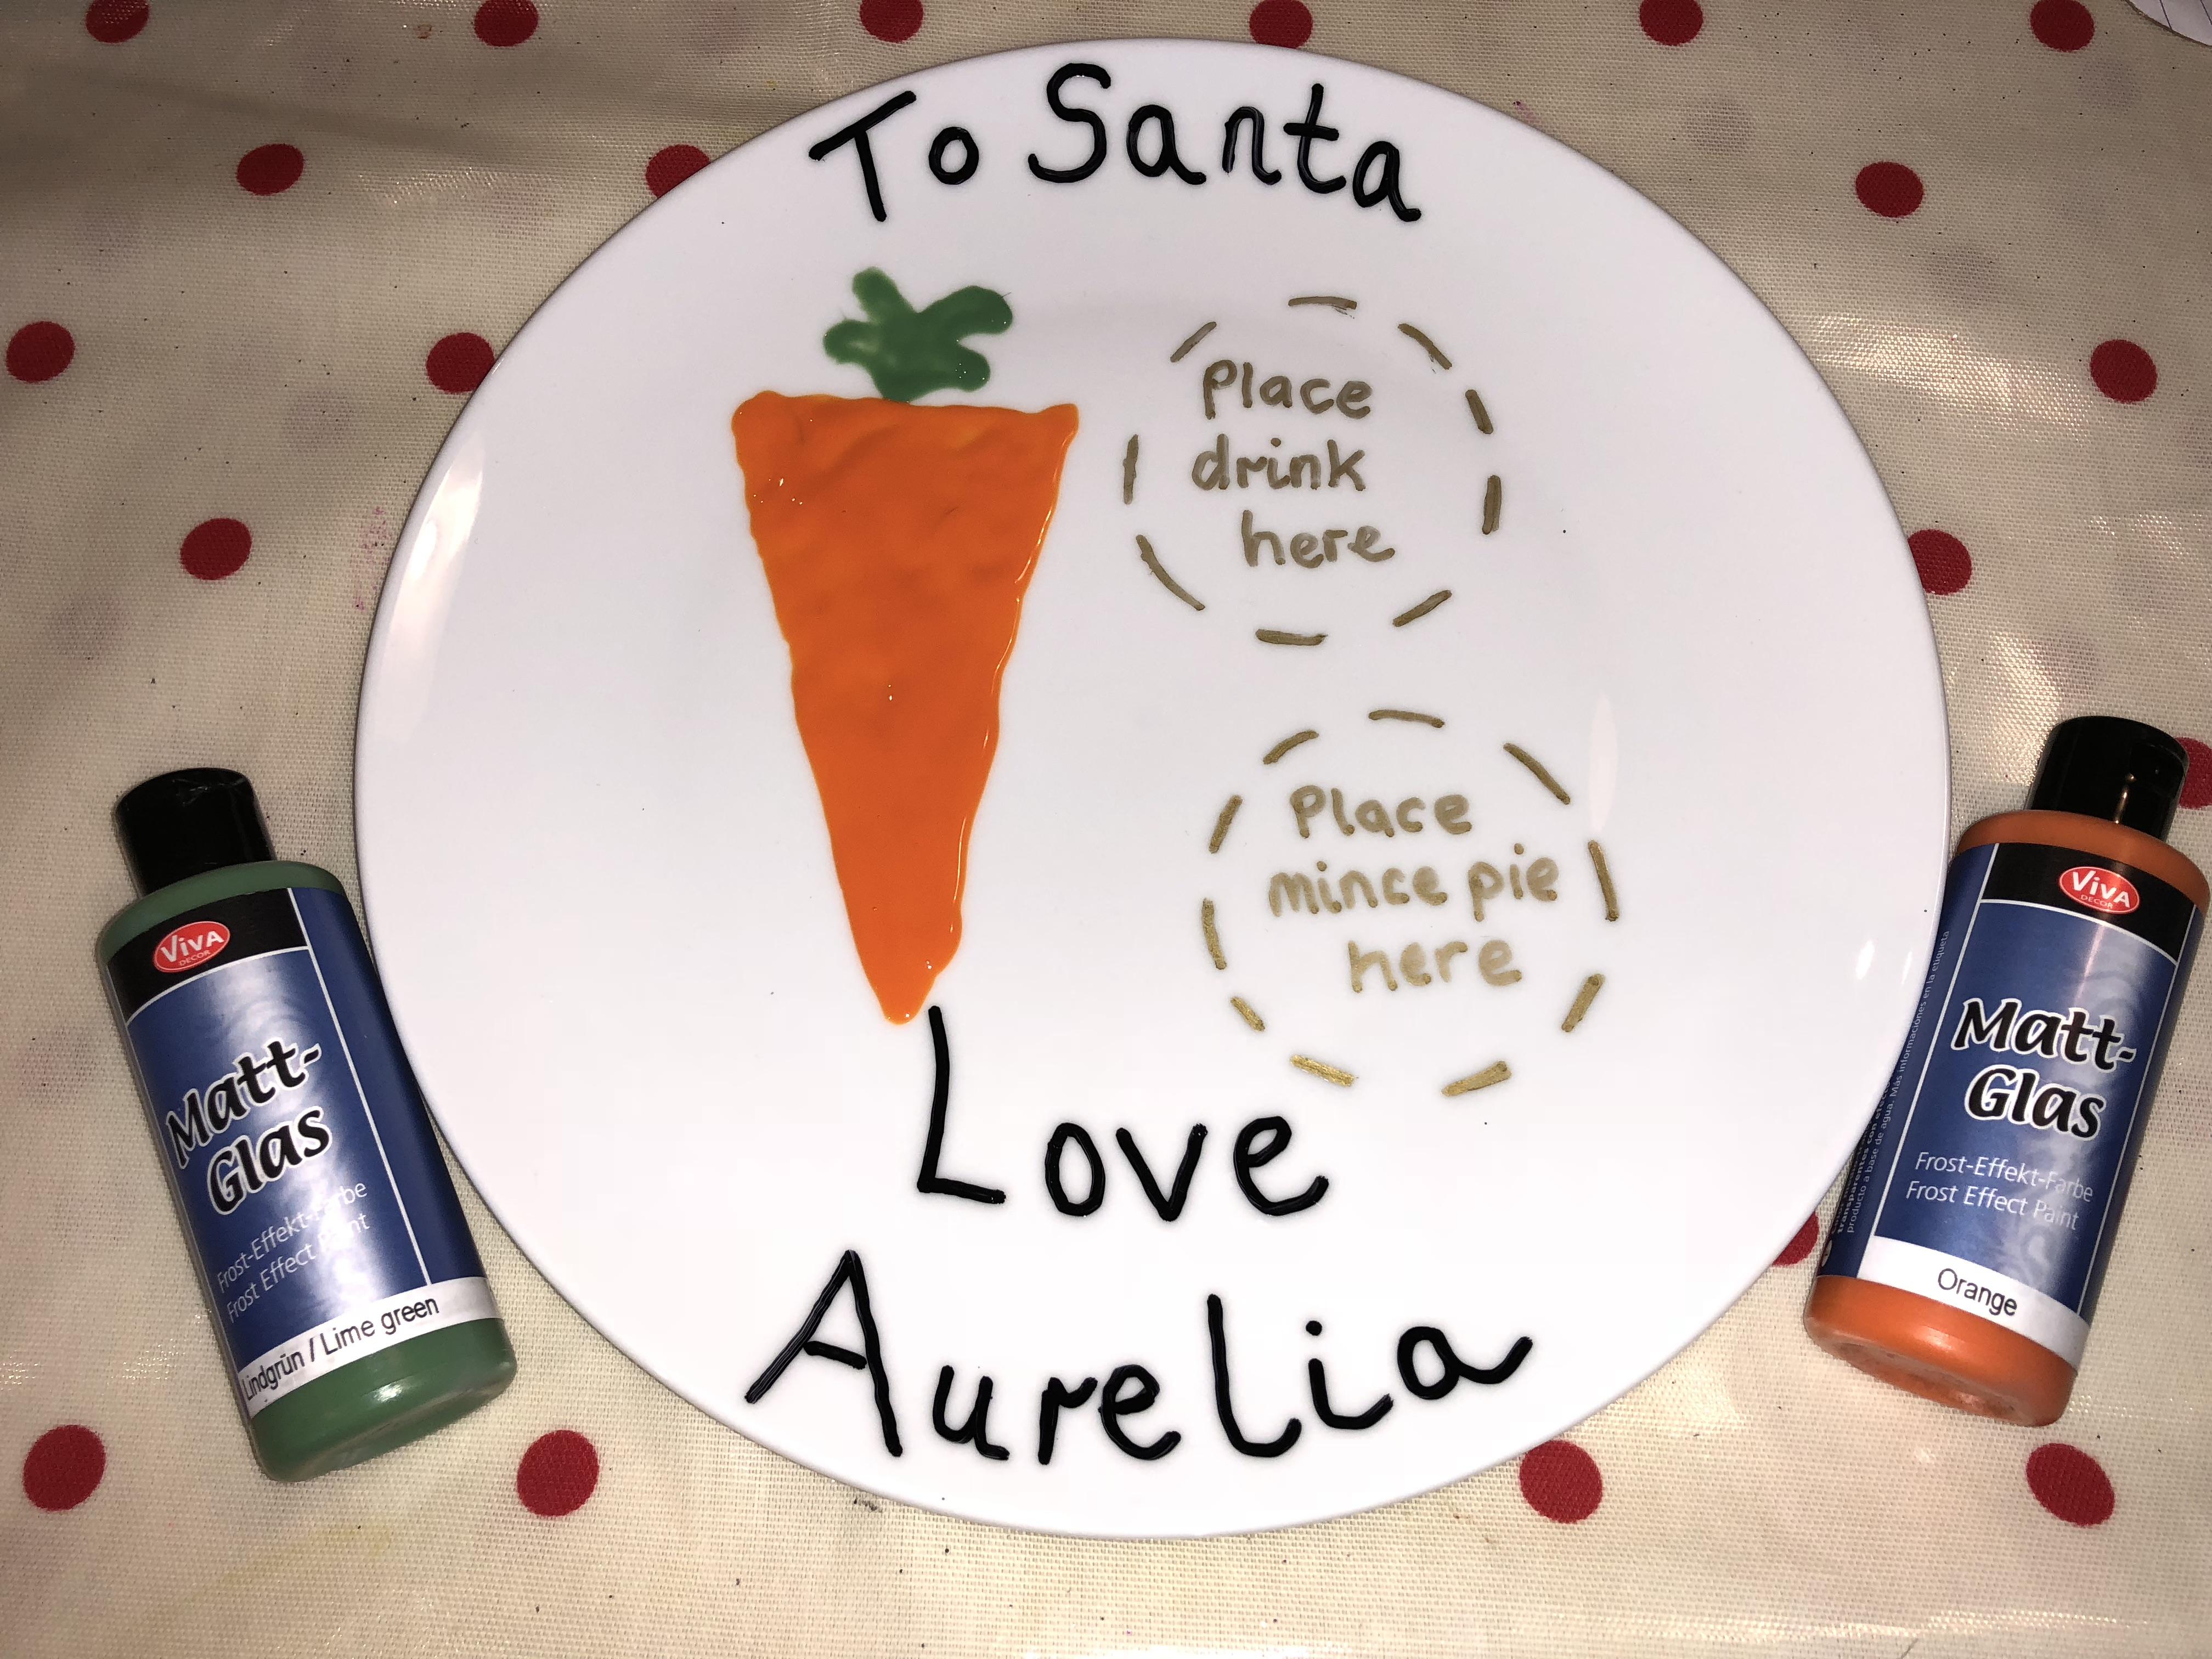 Rudolph's carrot